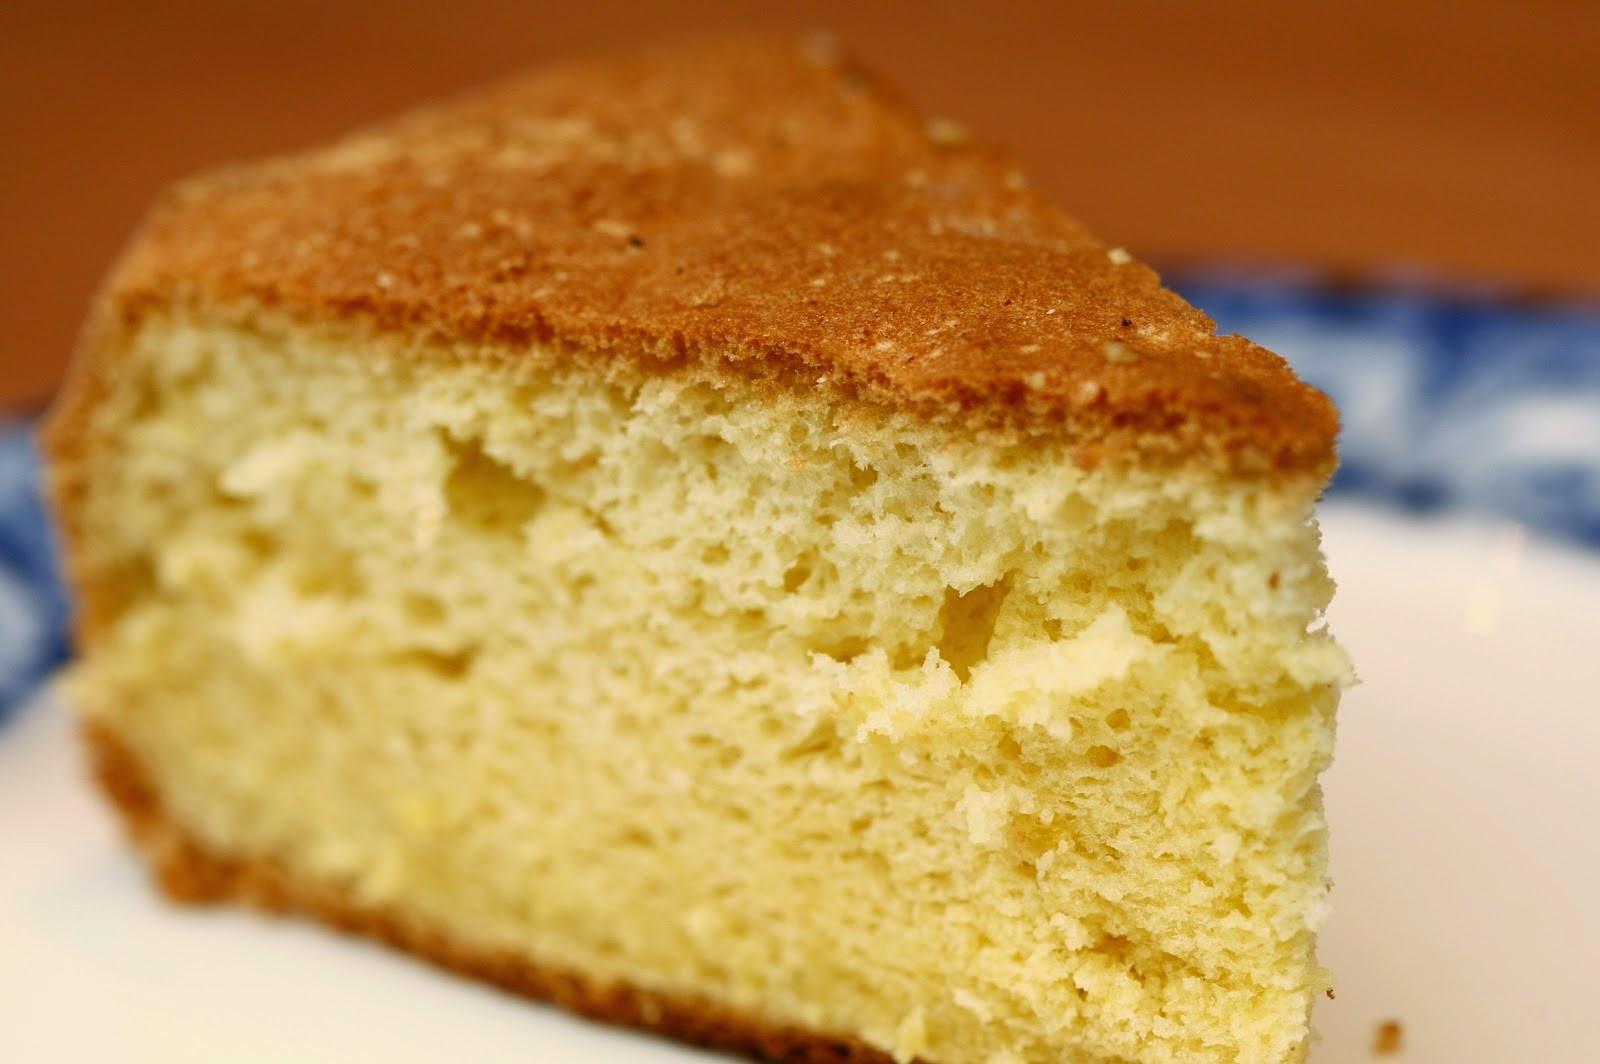 Riquísimo bizcochuelo preparado con harina de arroz o harina apta para celíacos y de bajas calorías!